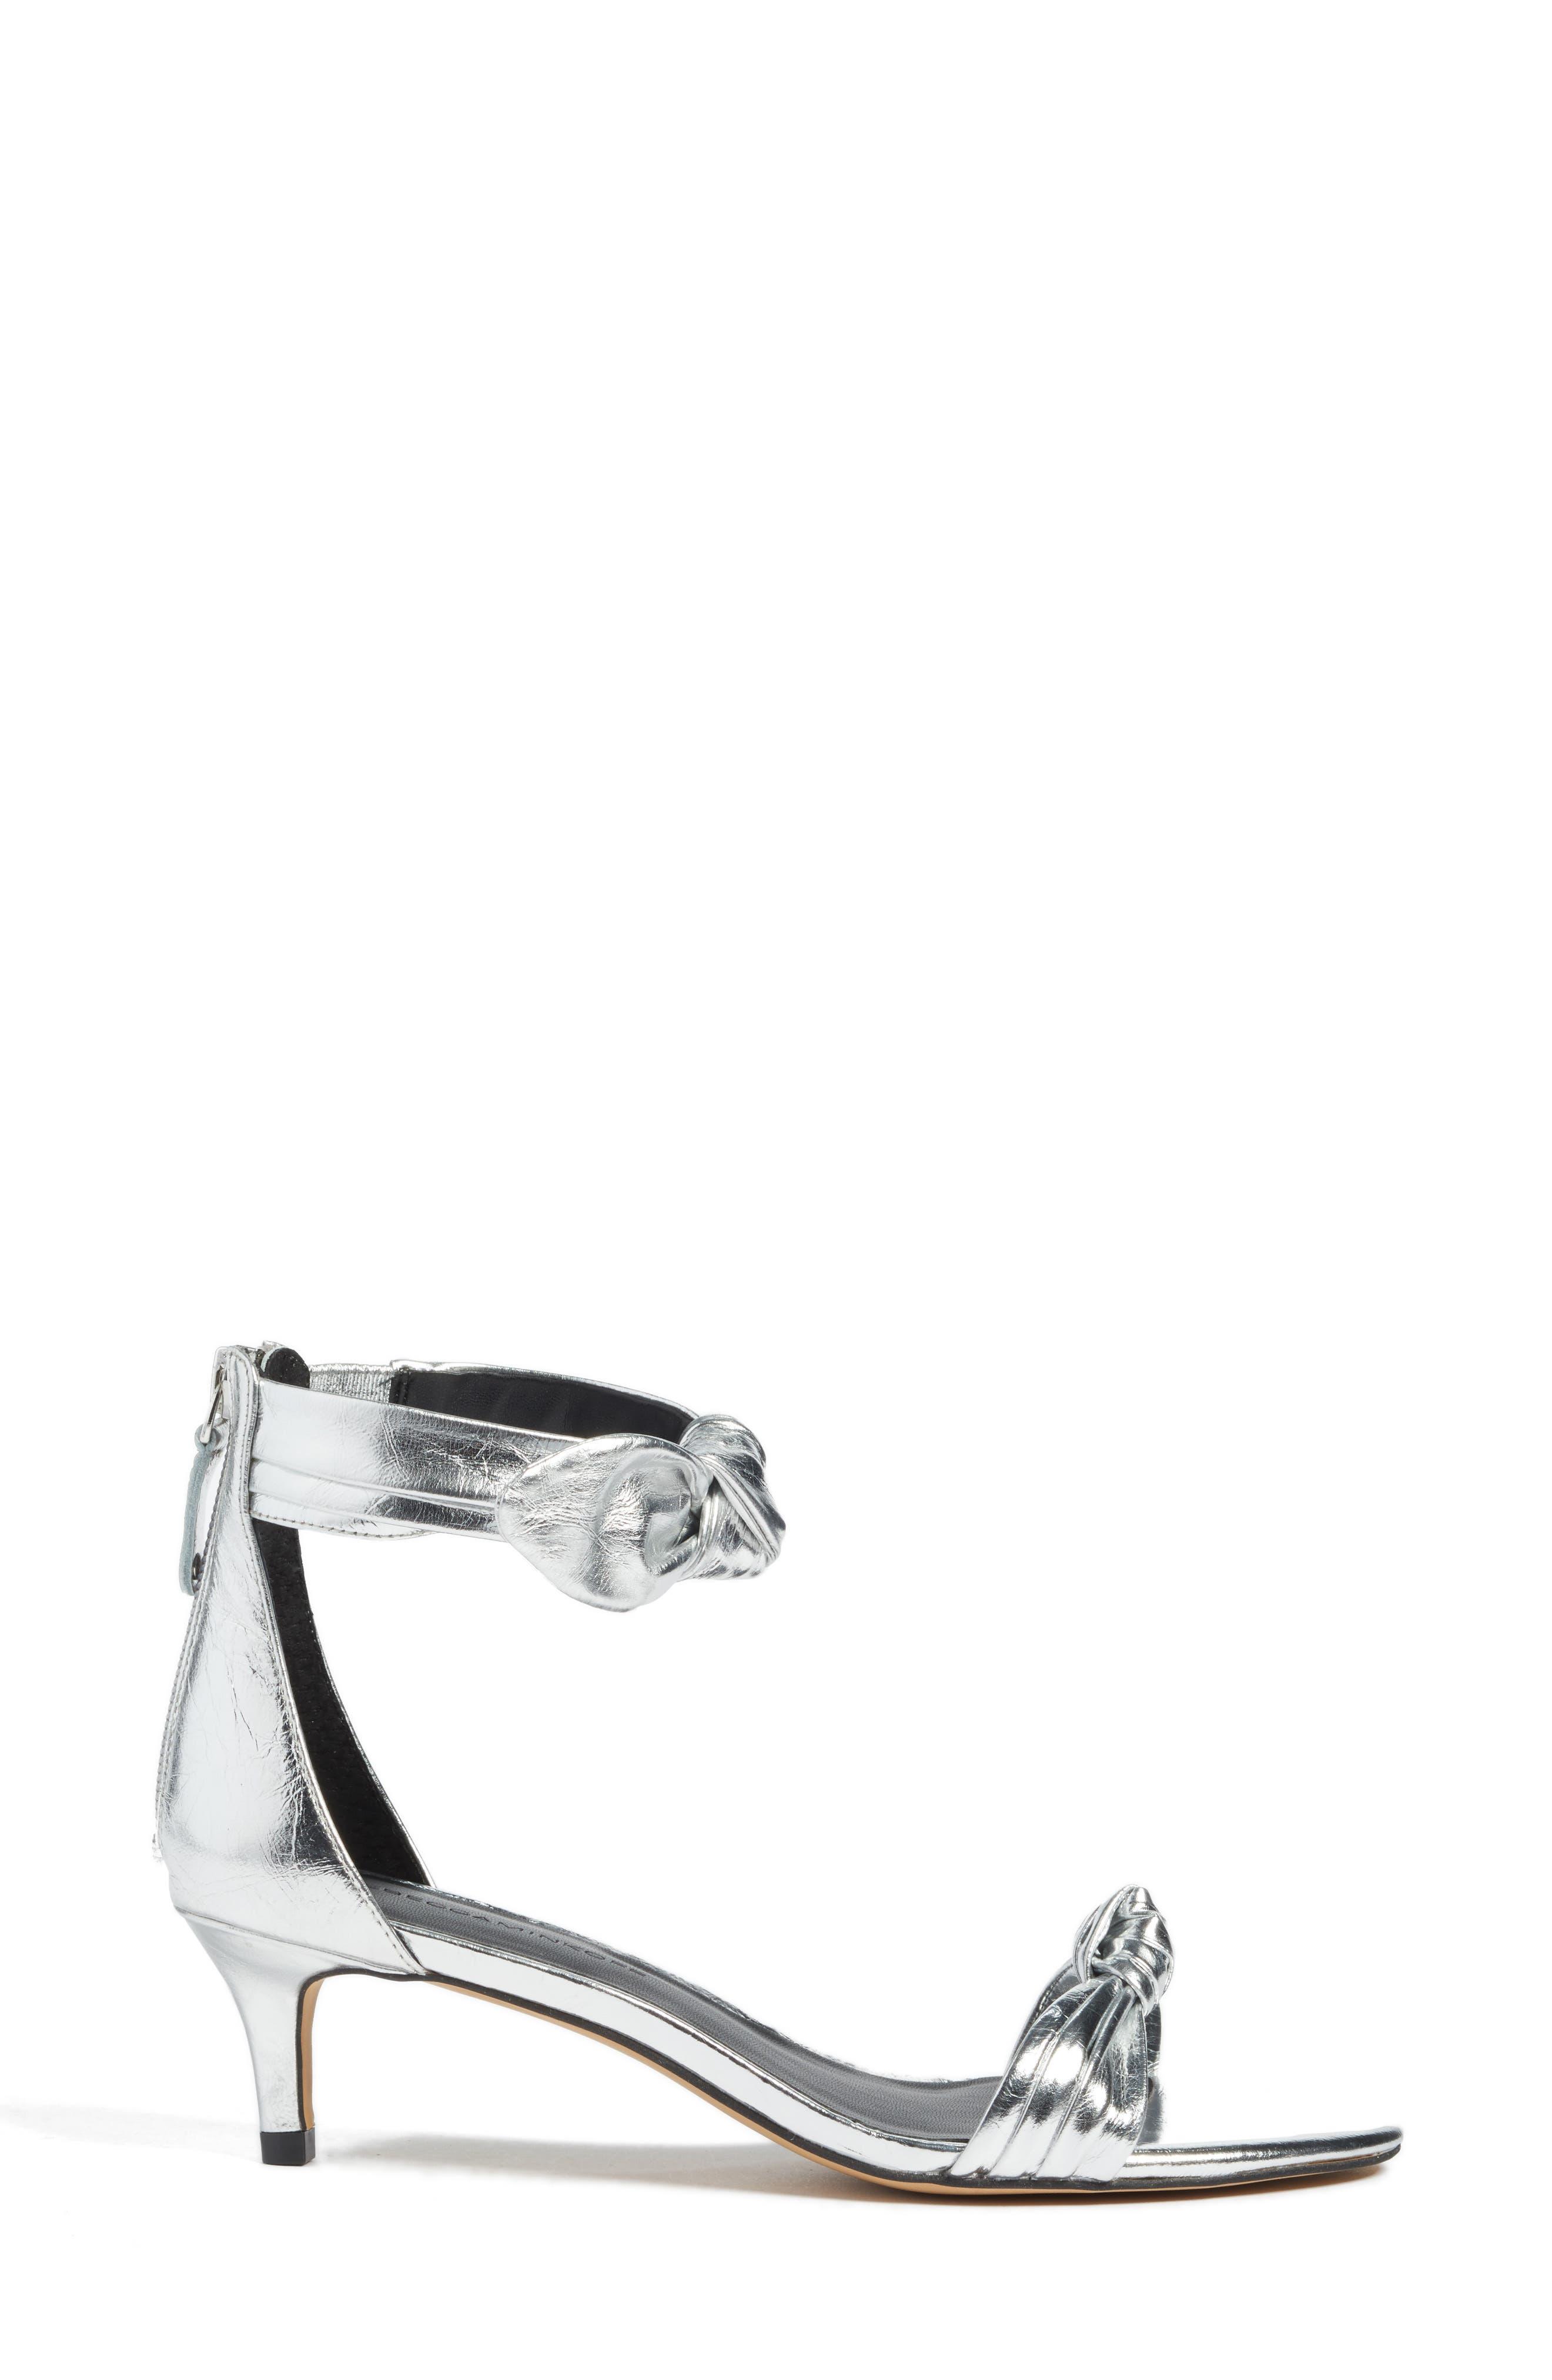 Kaley Knotted Kitten Heel Sandal,                             Alternate thumbnail 3, color,                             Silver Metallic Leather